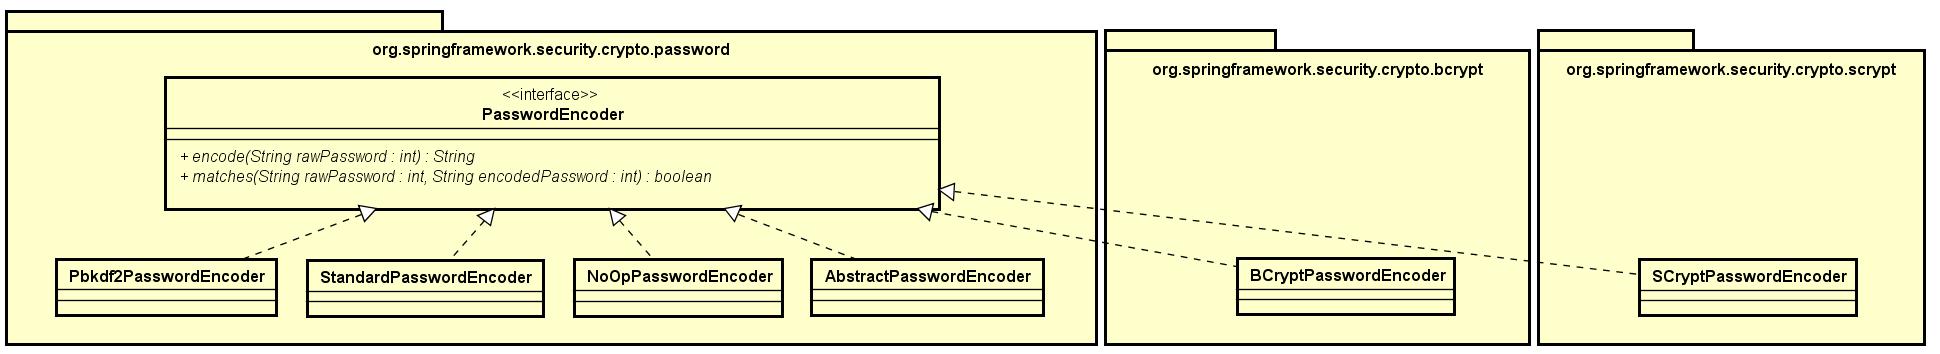 Spring Security PasswordEncoder Class Diagram1.png